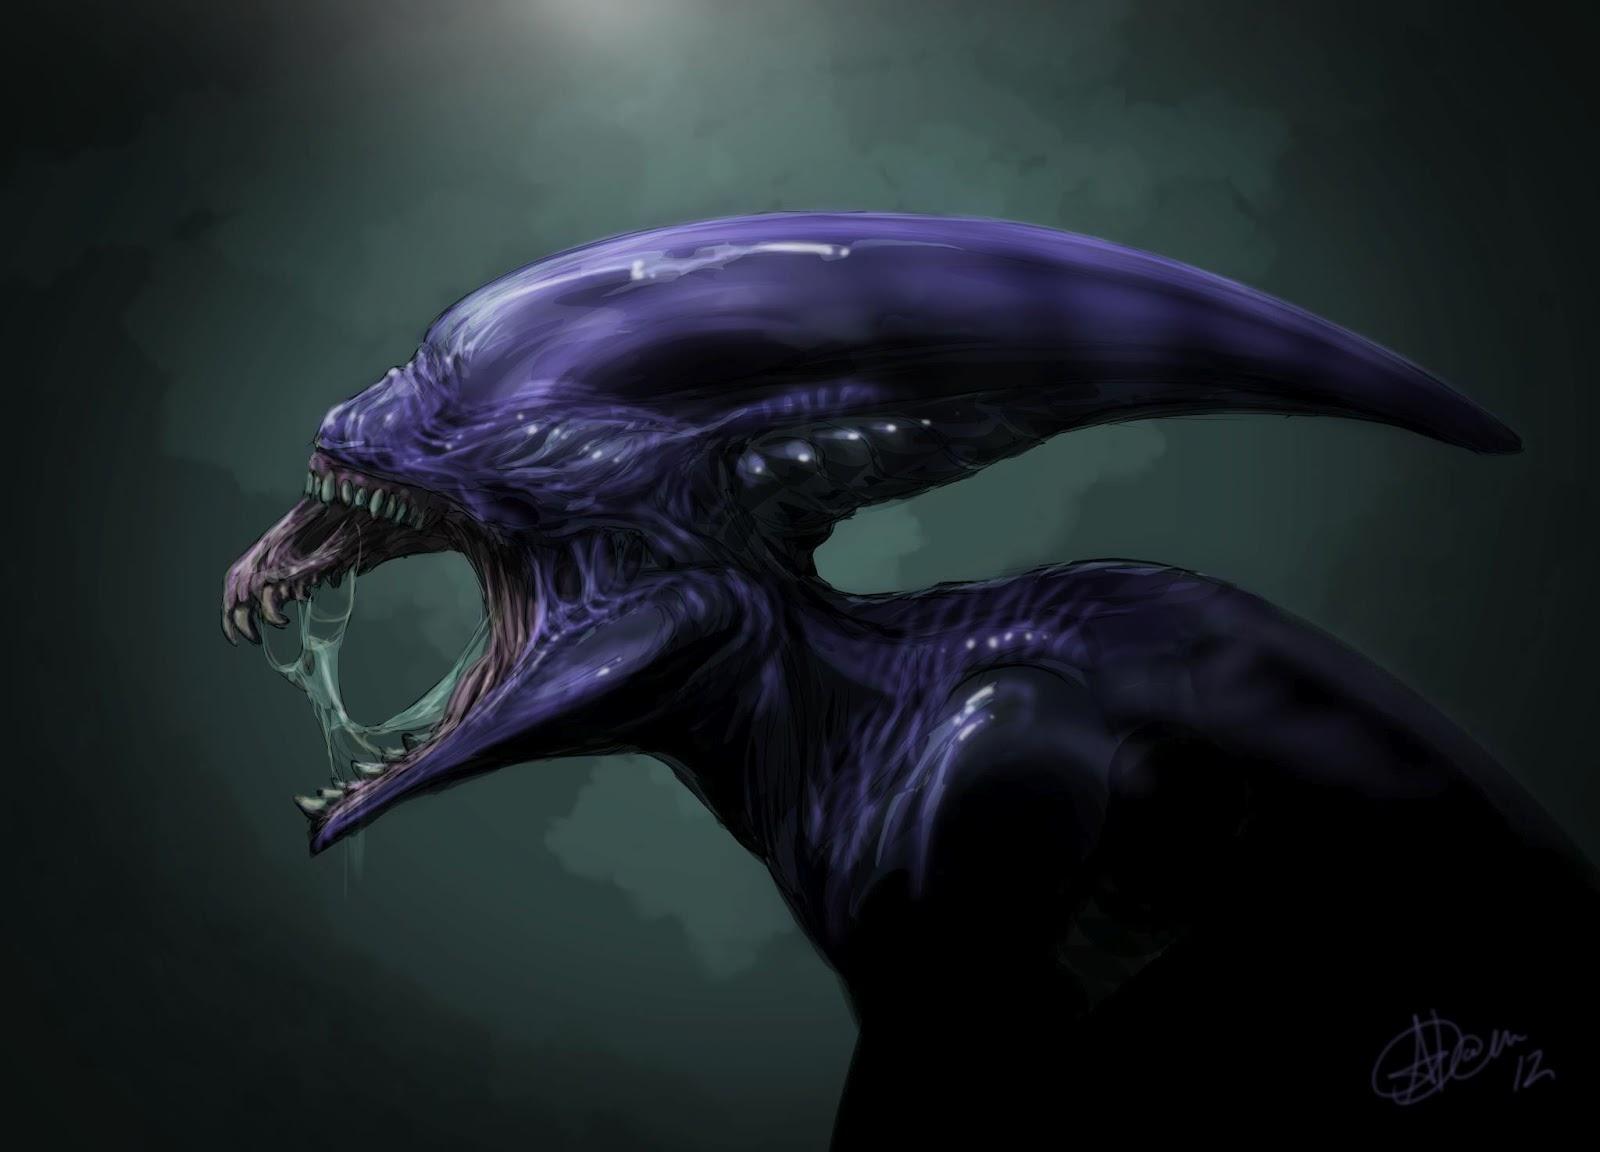 Is alien covenant not prometheus 2? Youtube.